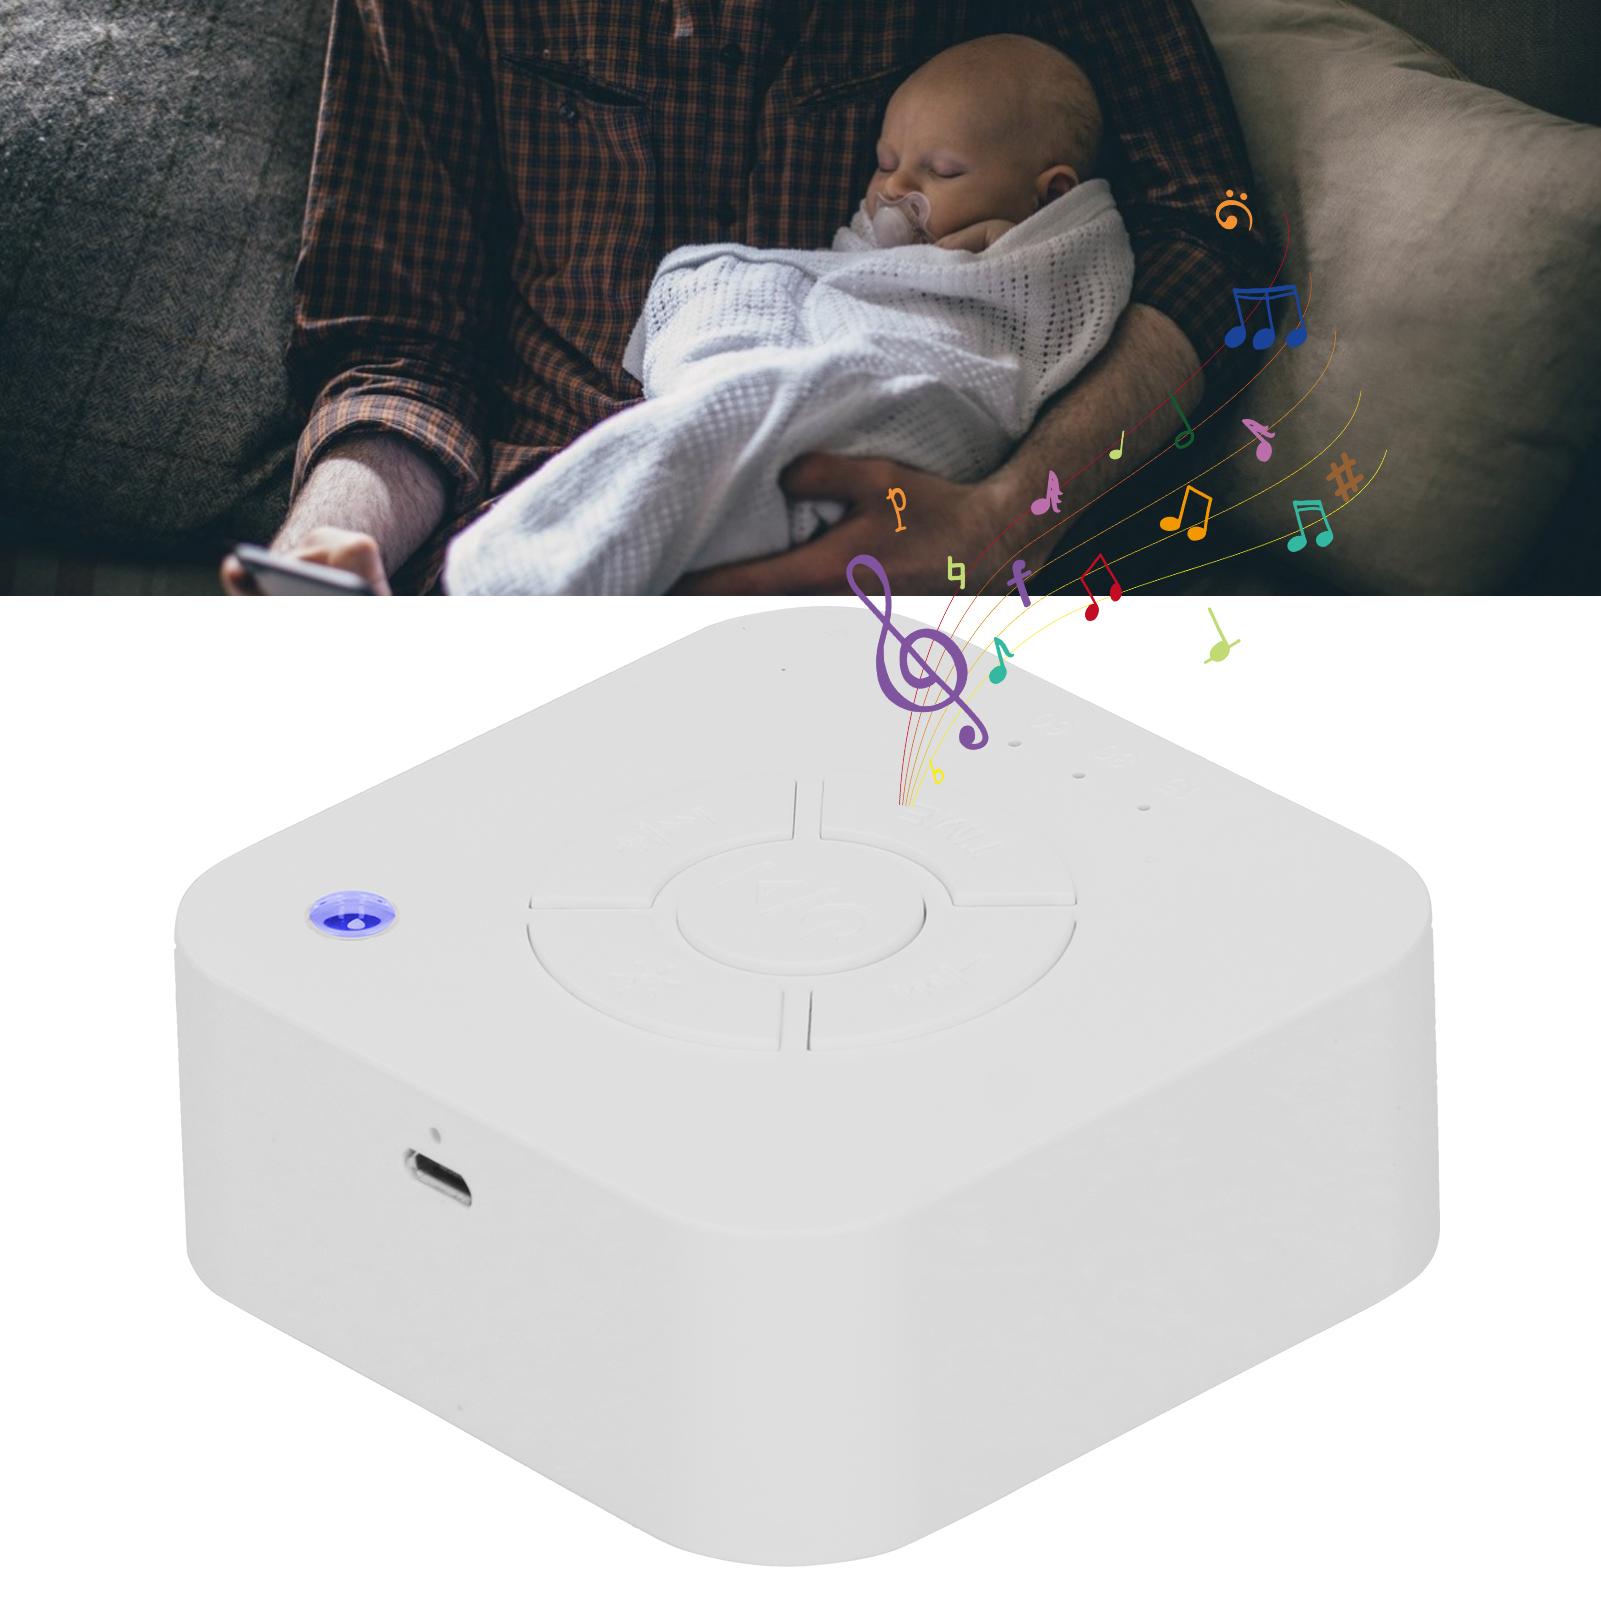 Indexbild 6 - Sleep Machine White‑Noise Aid Music Light Device Infant Breathing Therapy Sound